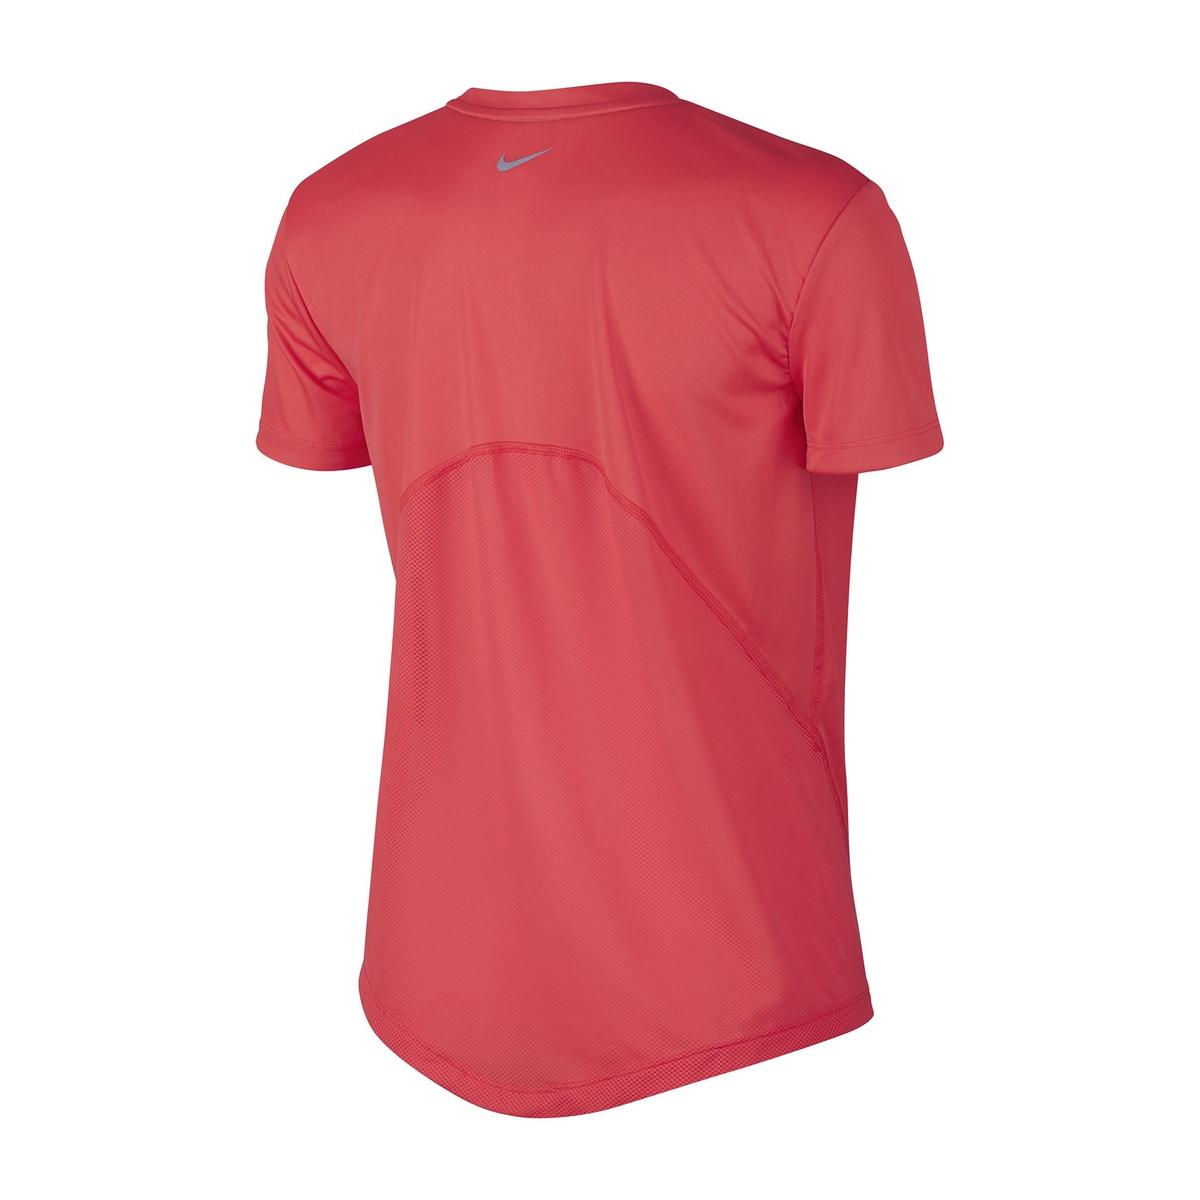 Imagen secundaria de producto de Camiseta Miler Miler - Nike